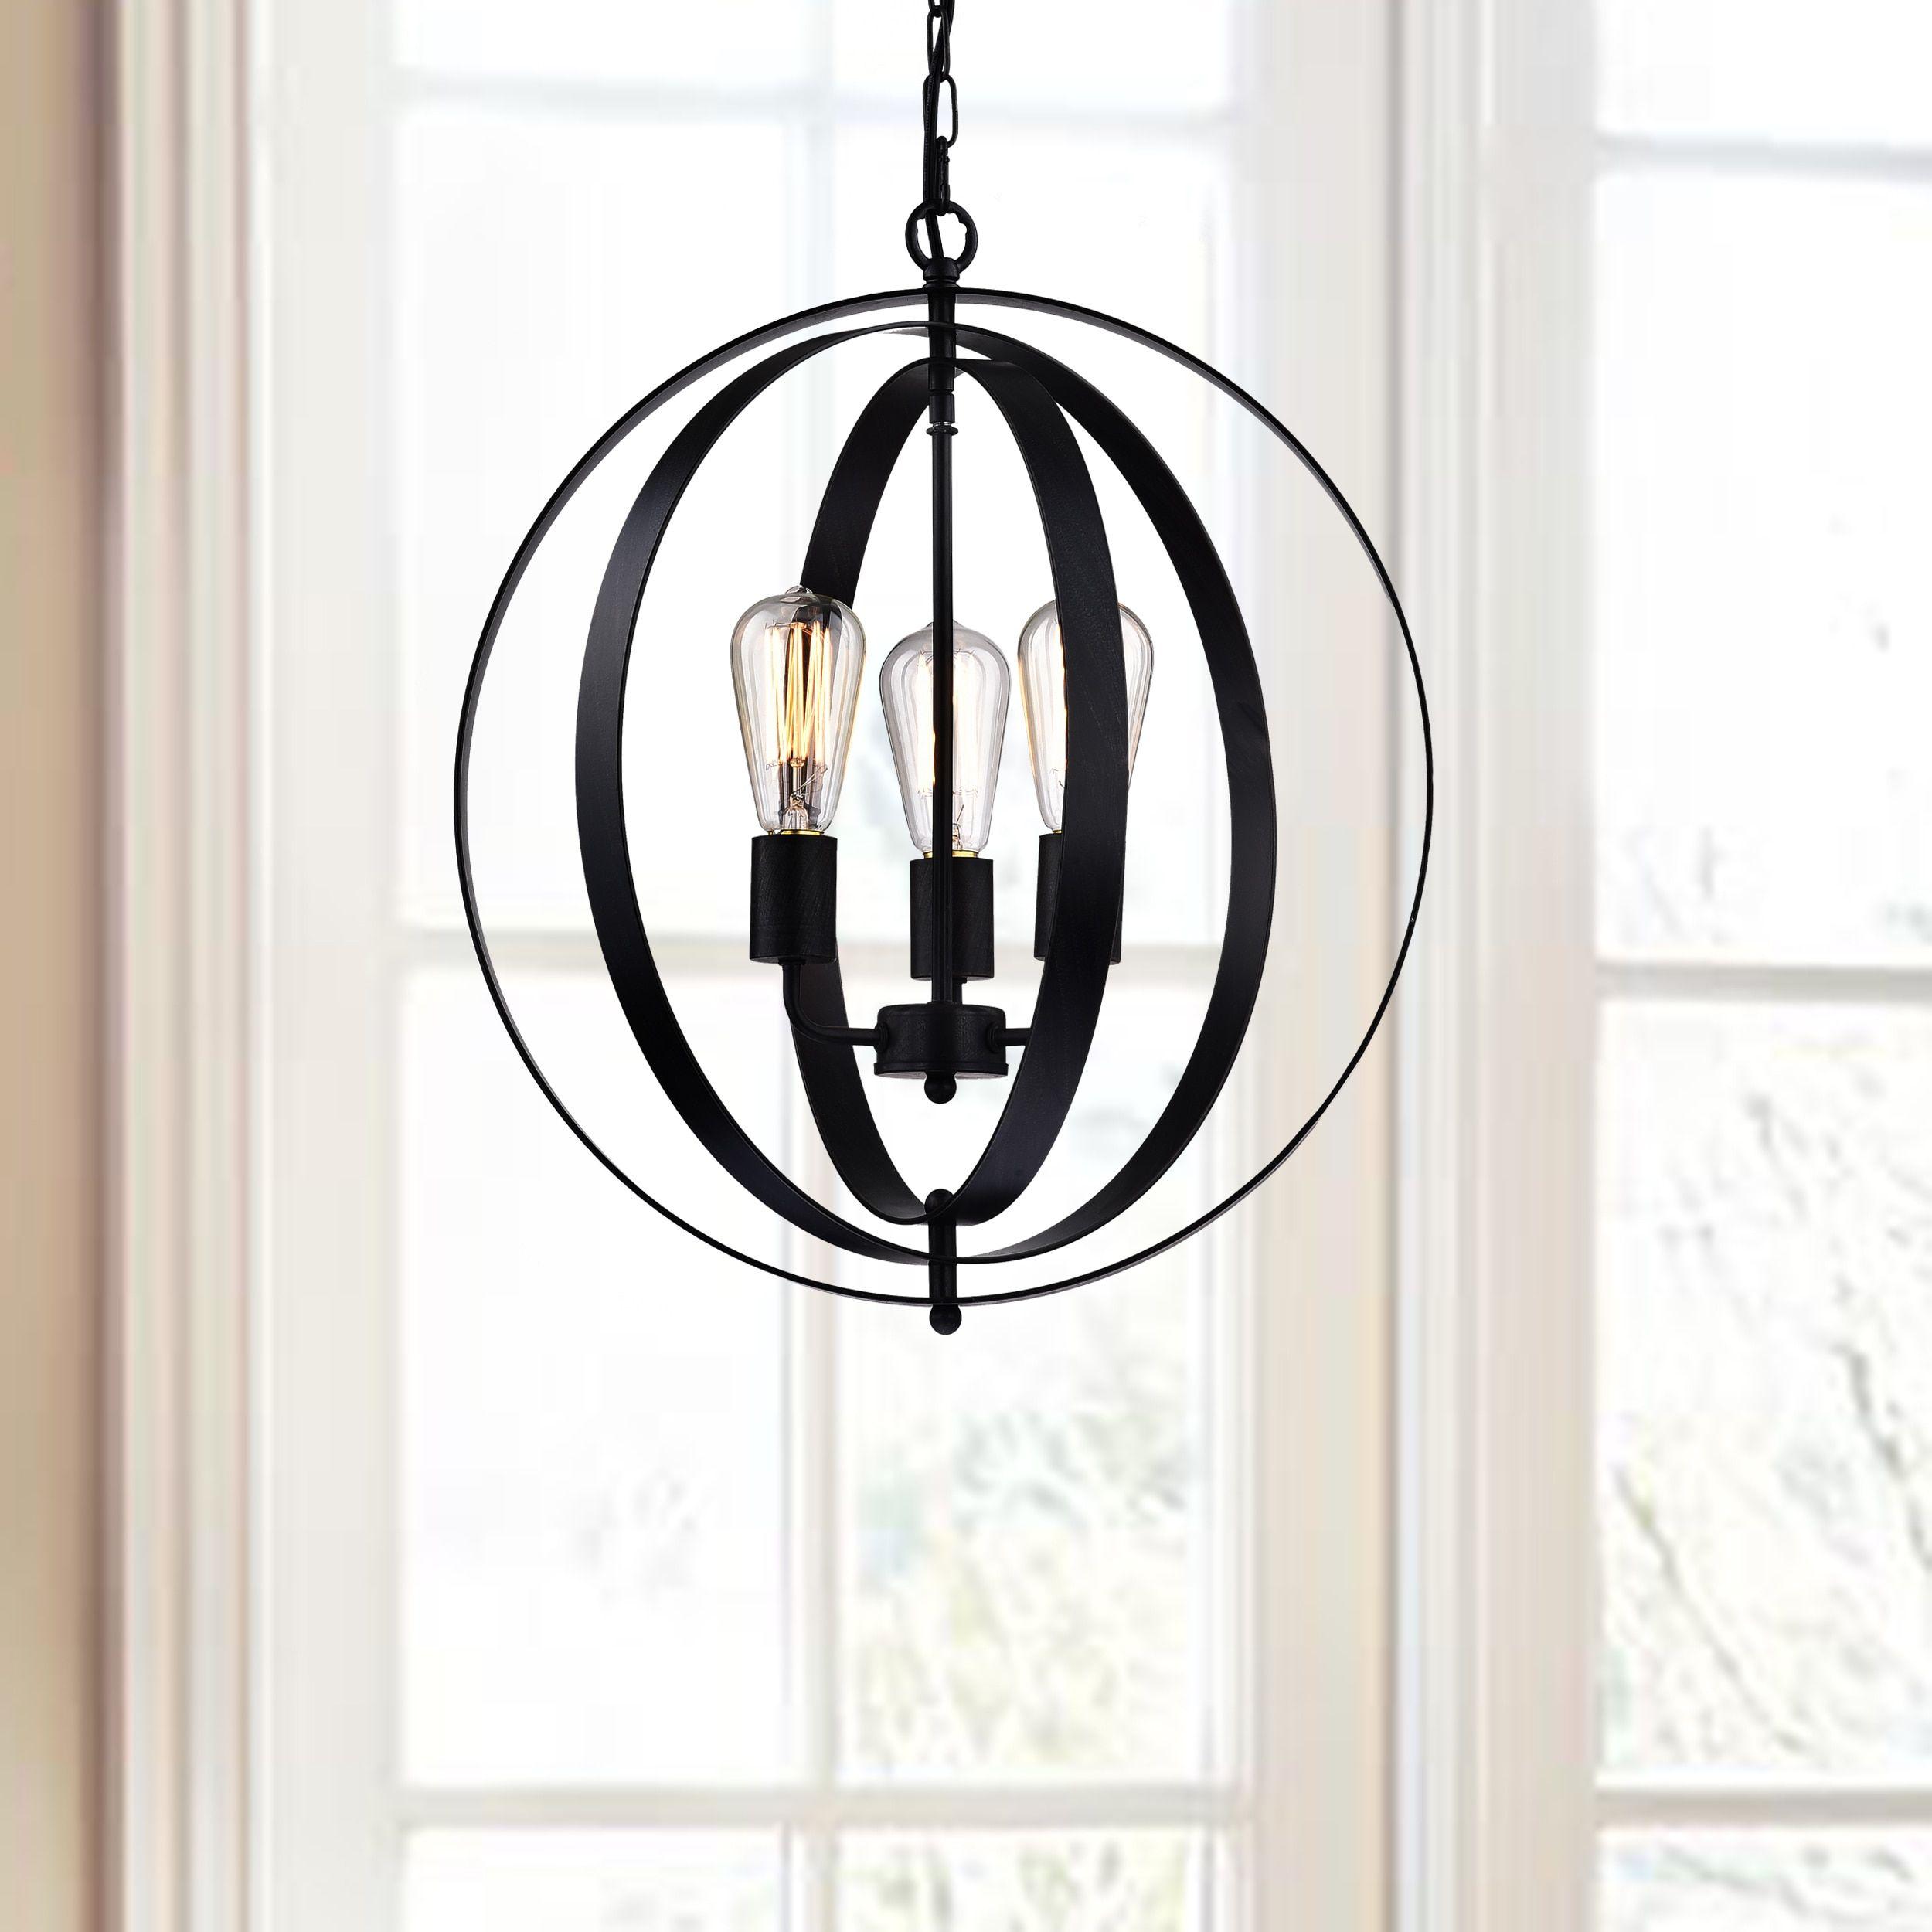 Benita Antique Black 3 light Concentric Mixed Iron Rings Orb